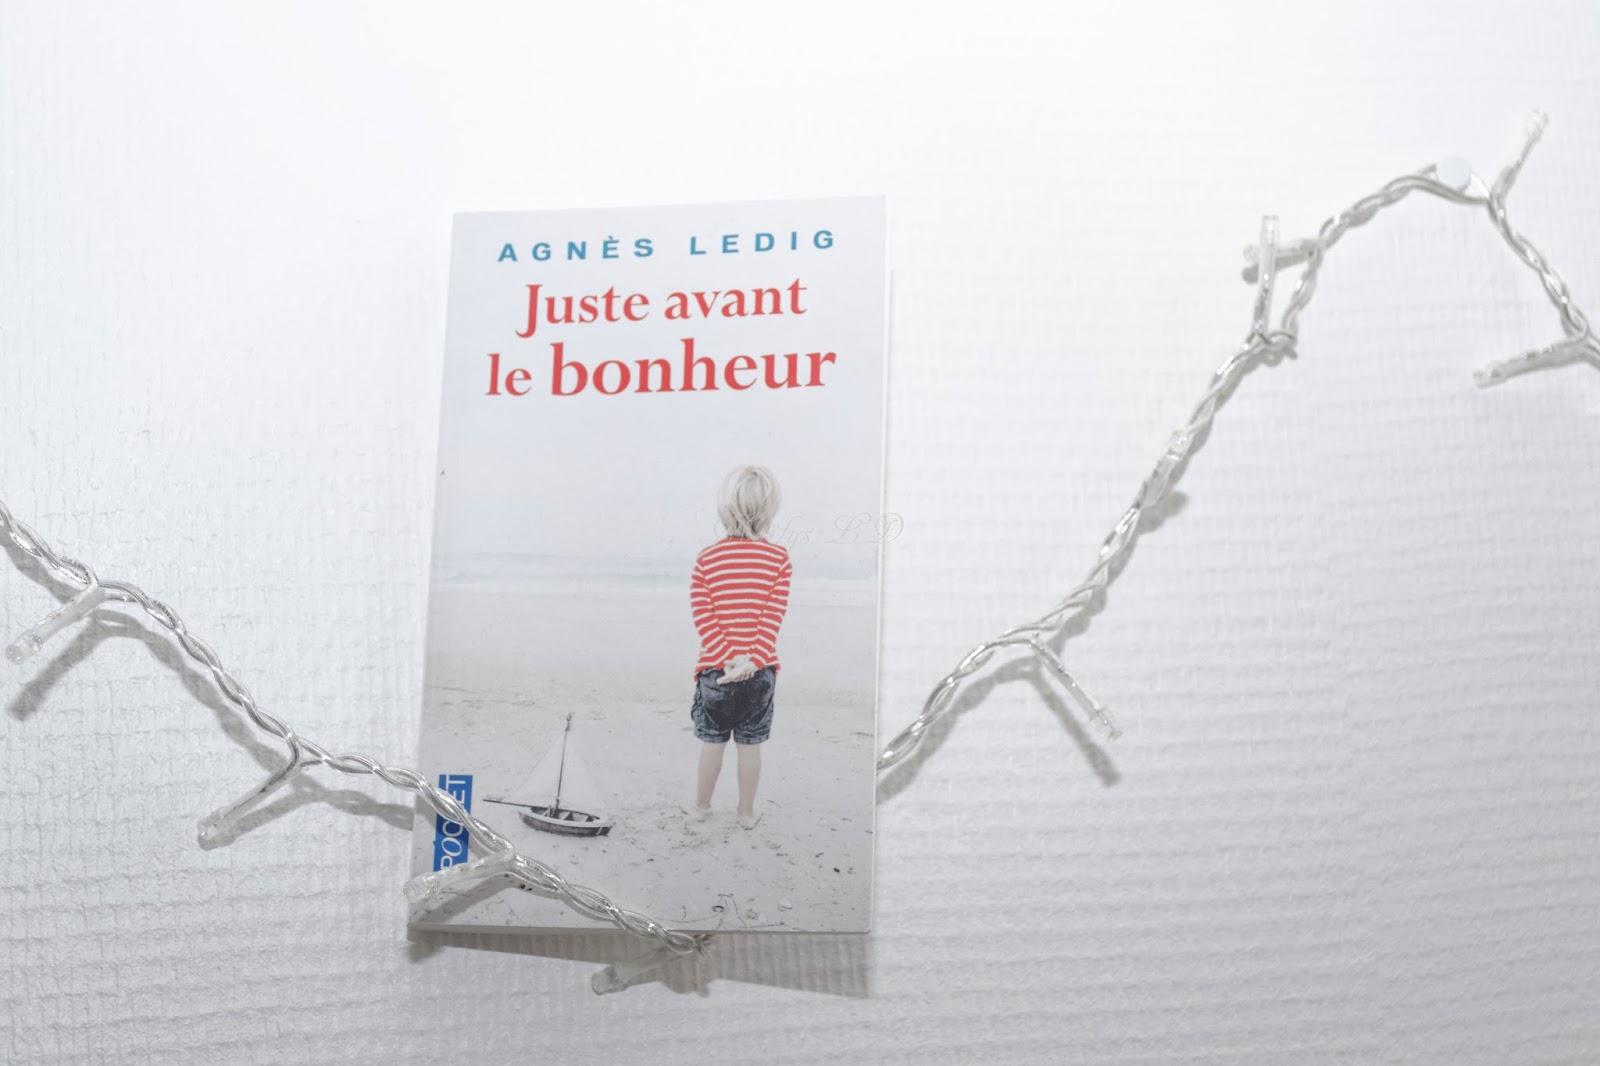 https://www.notebook.ldmailys.com/2017/07/juste-avant-le-bonheur.html